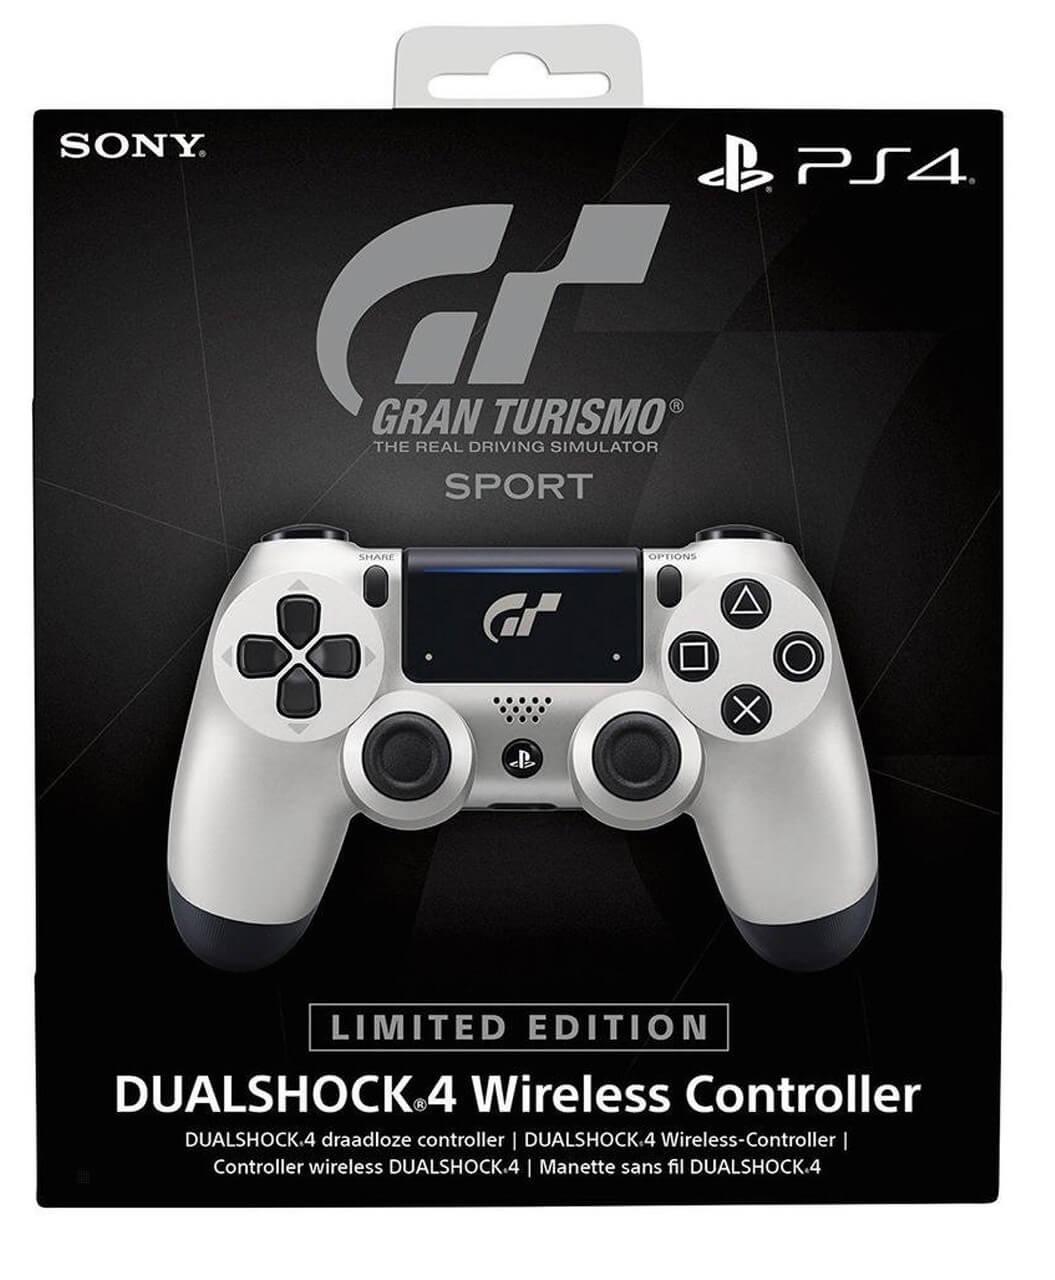 Sony PlayStation DualShock 4 V2 Controller - GT Sport Edition